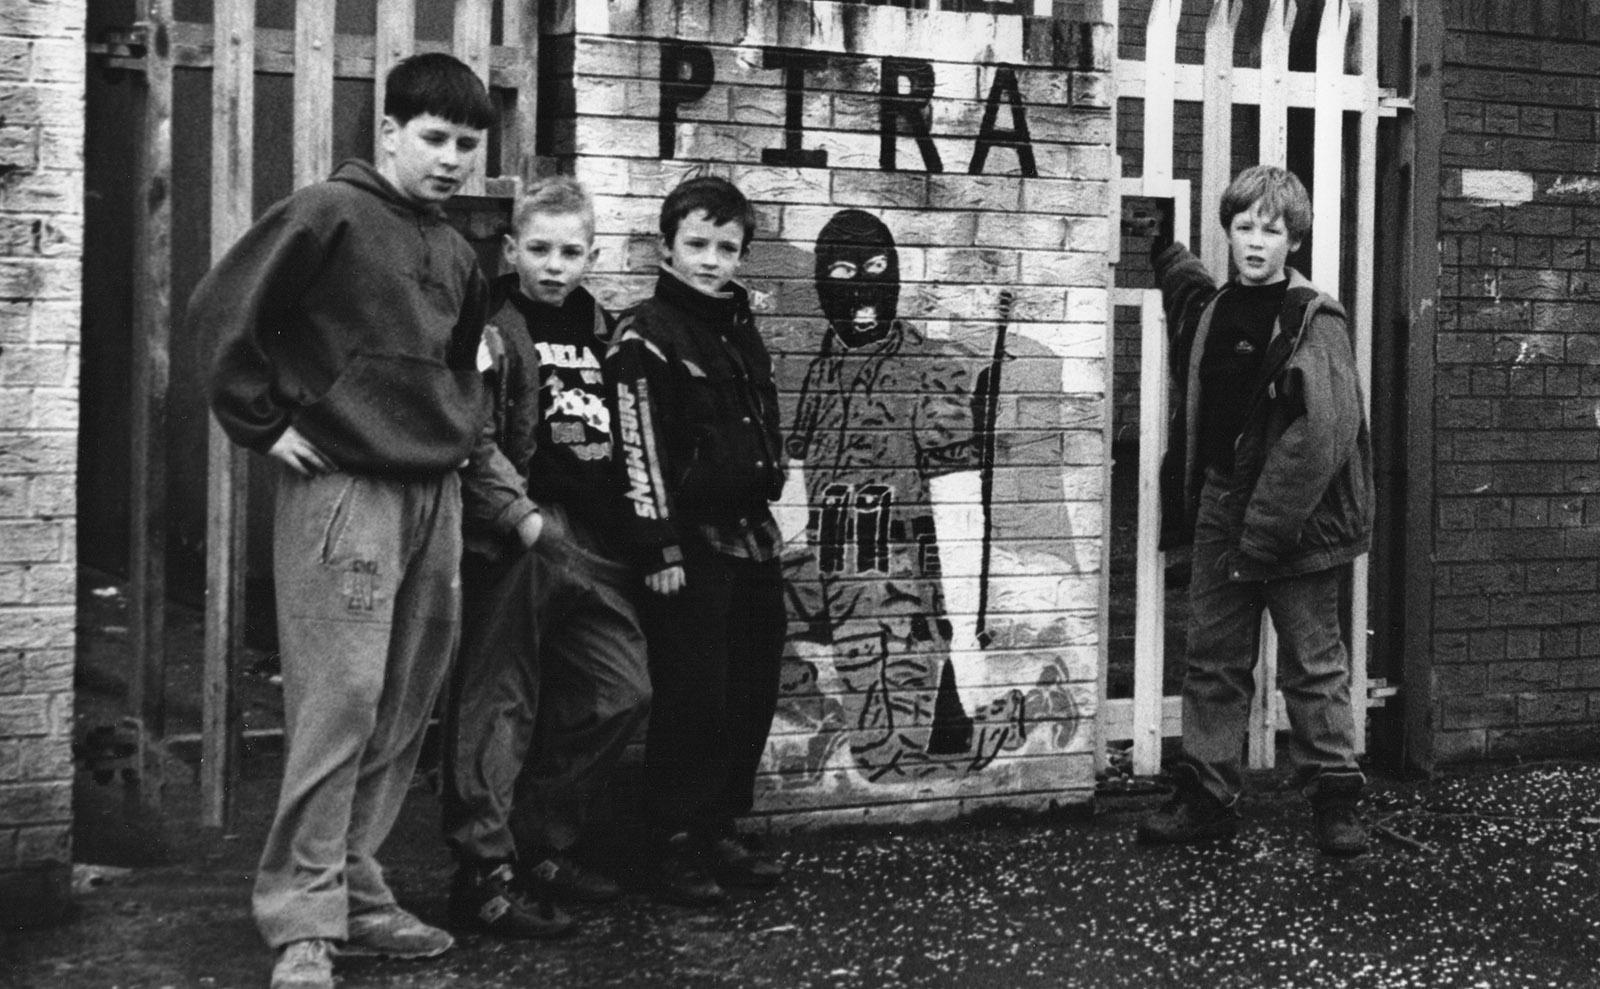 neighborhood kids posing with mural honoring members of provisional irish republican army in west belfast, northern ireland